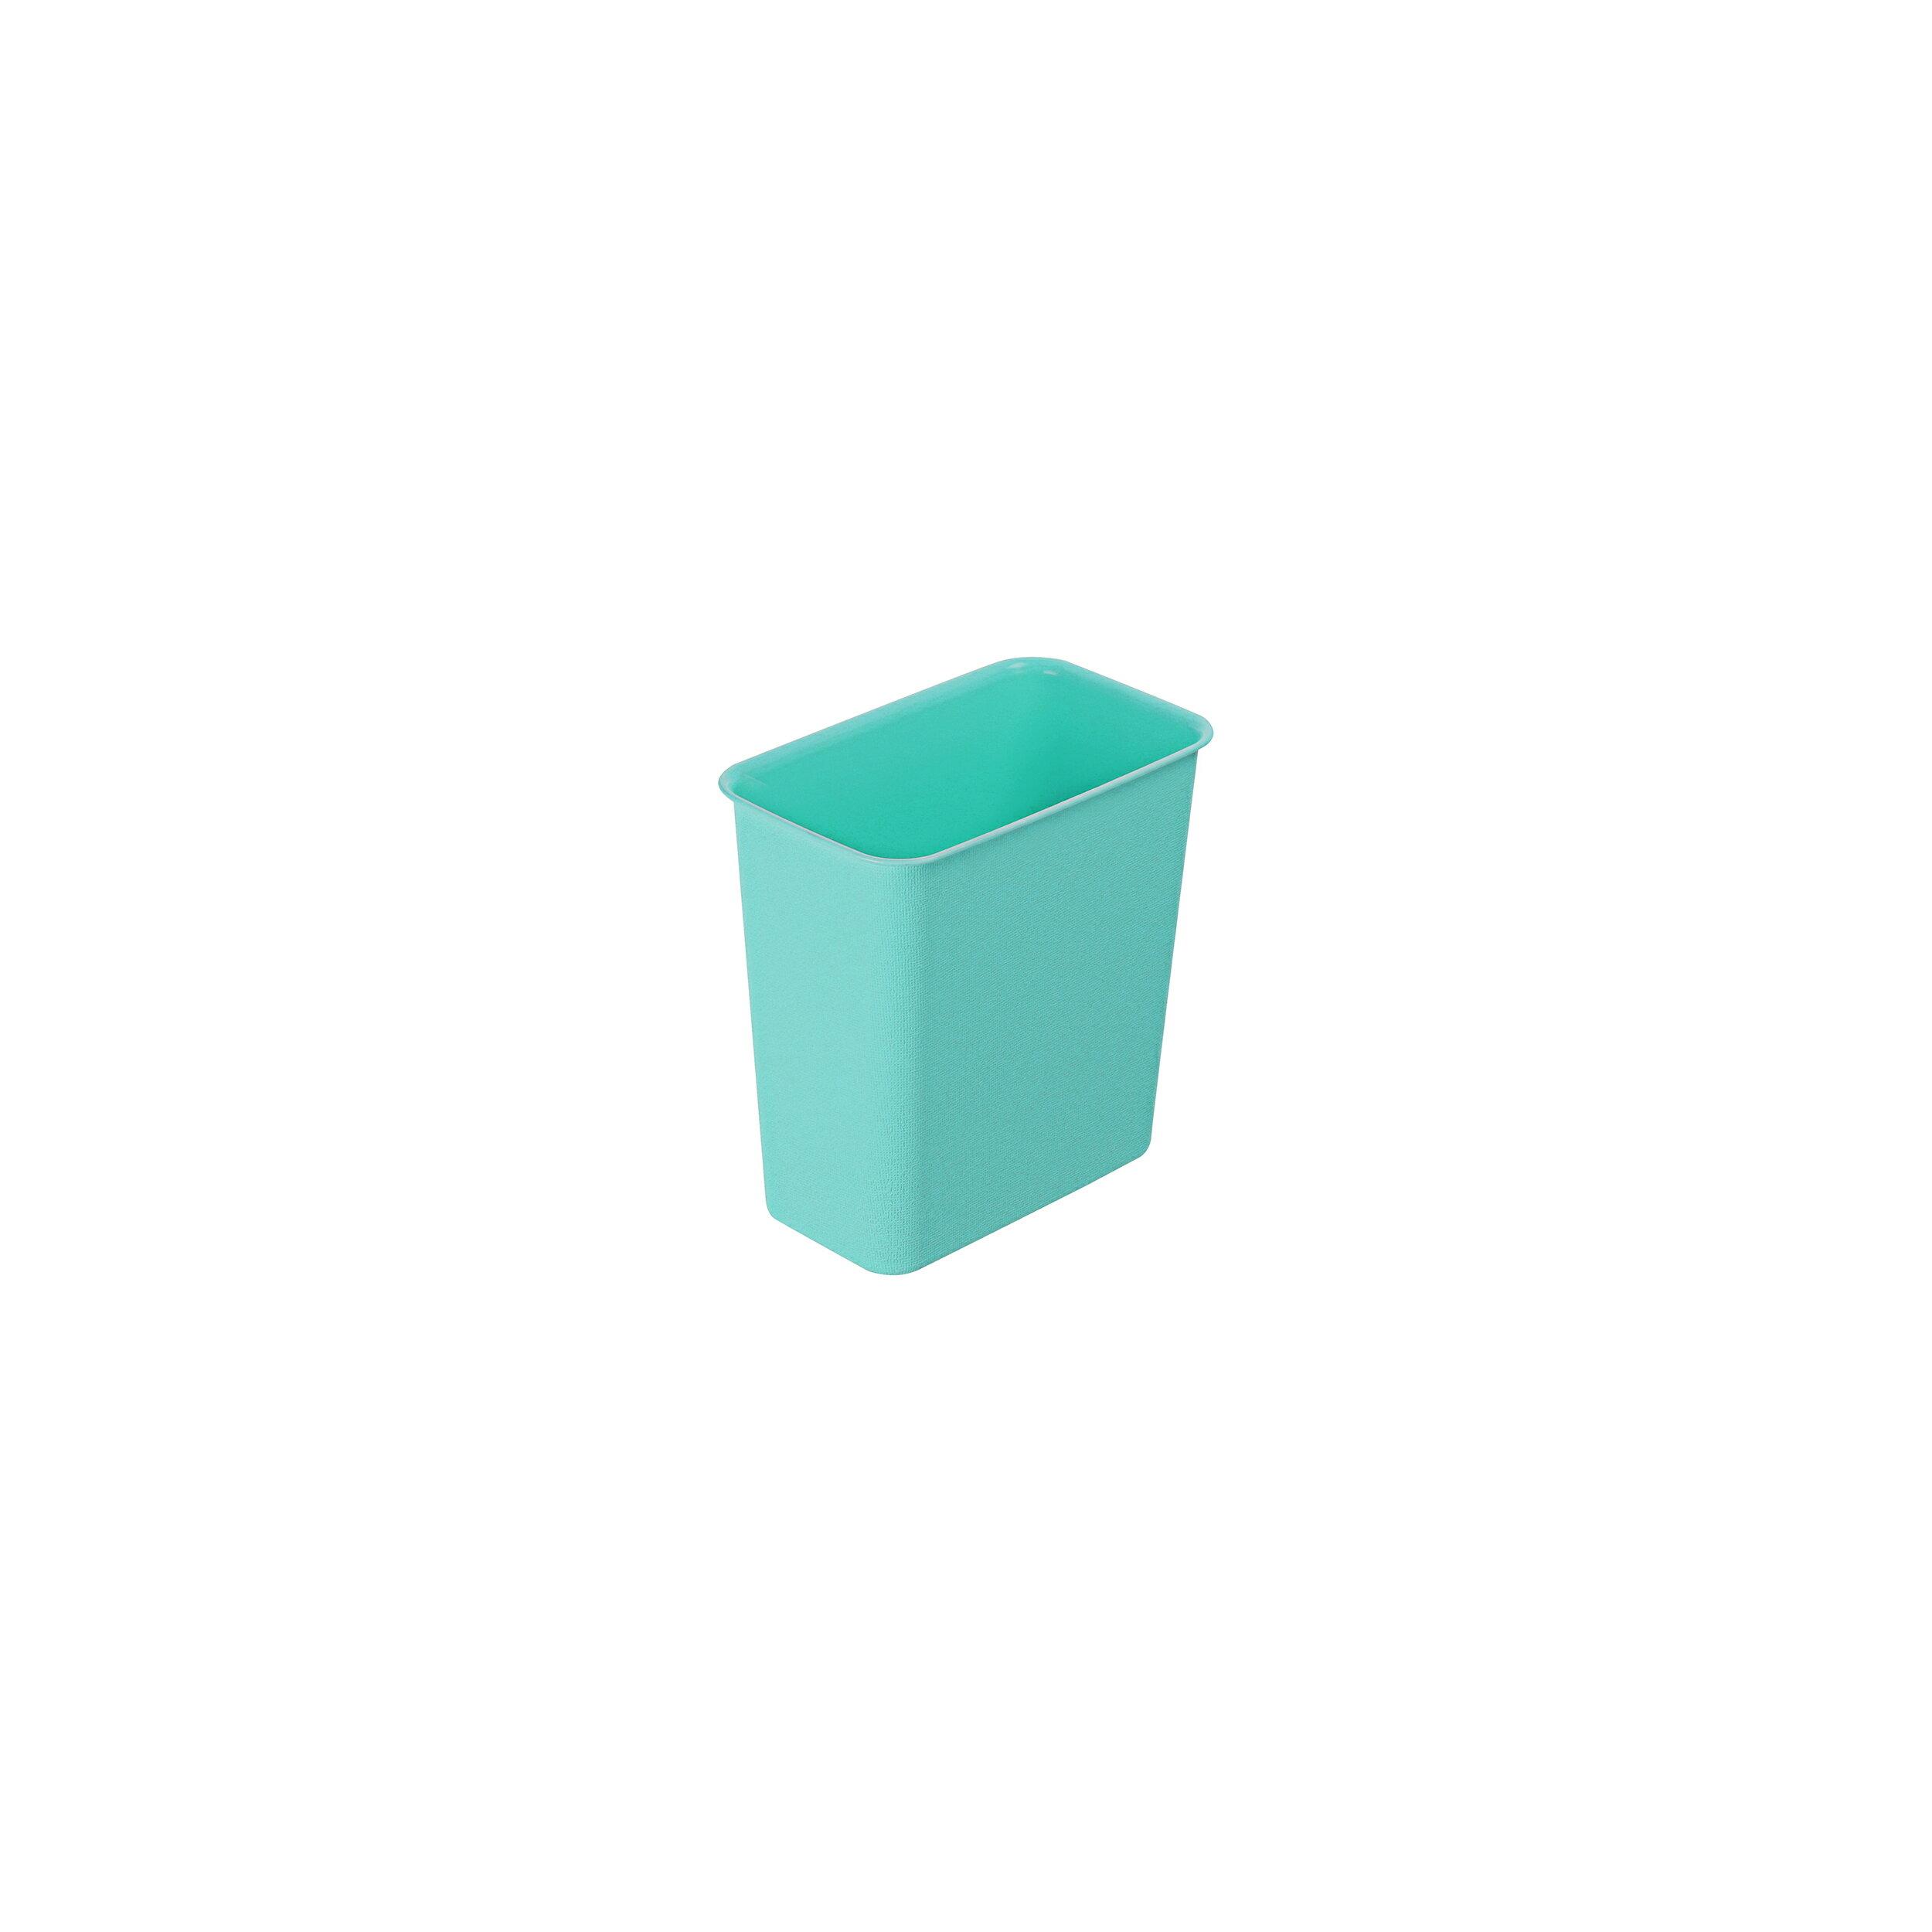 KEYWAY聯府 MIT 小彩虹垃圾桶(長型)C9303(顏色隨機出貨) 1